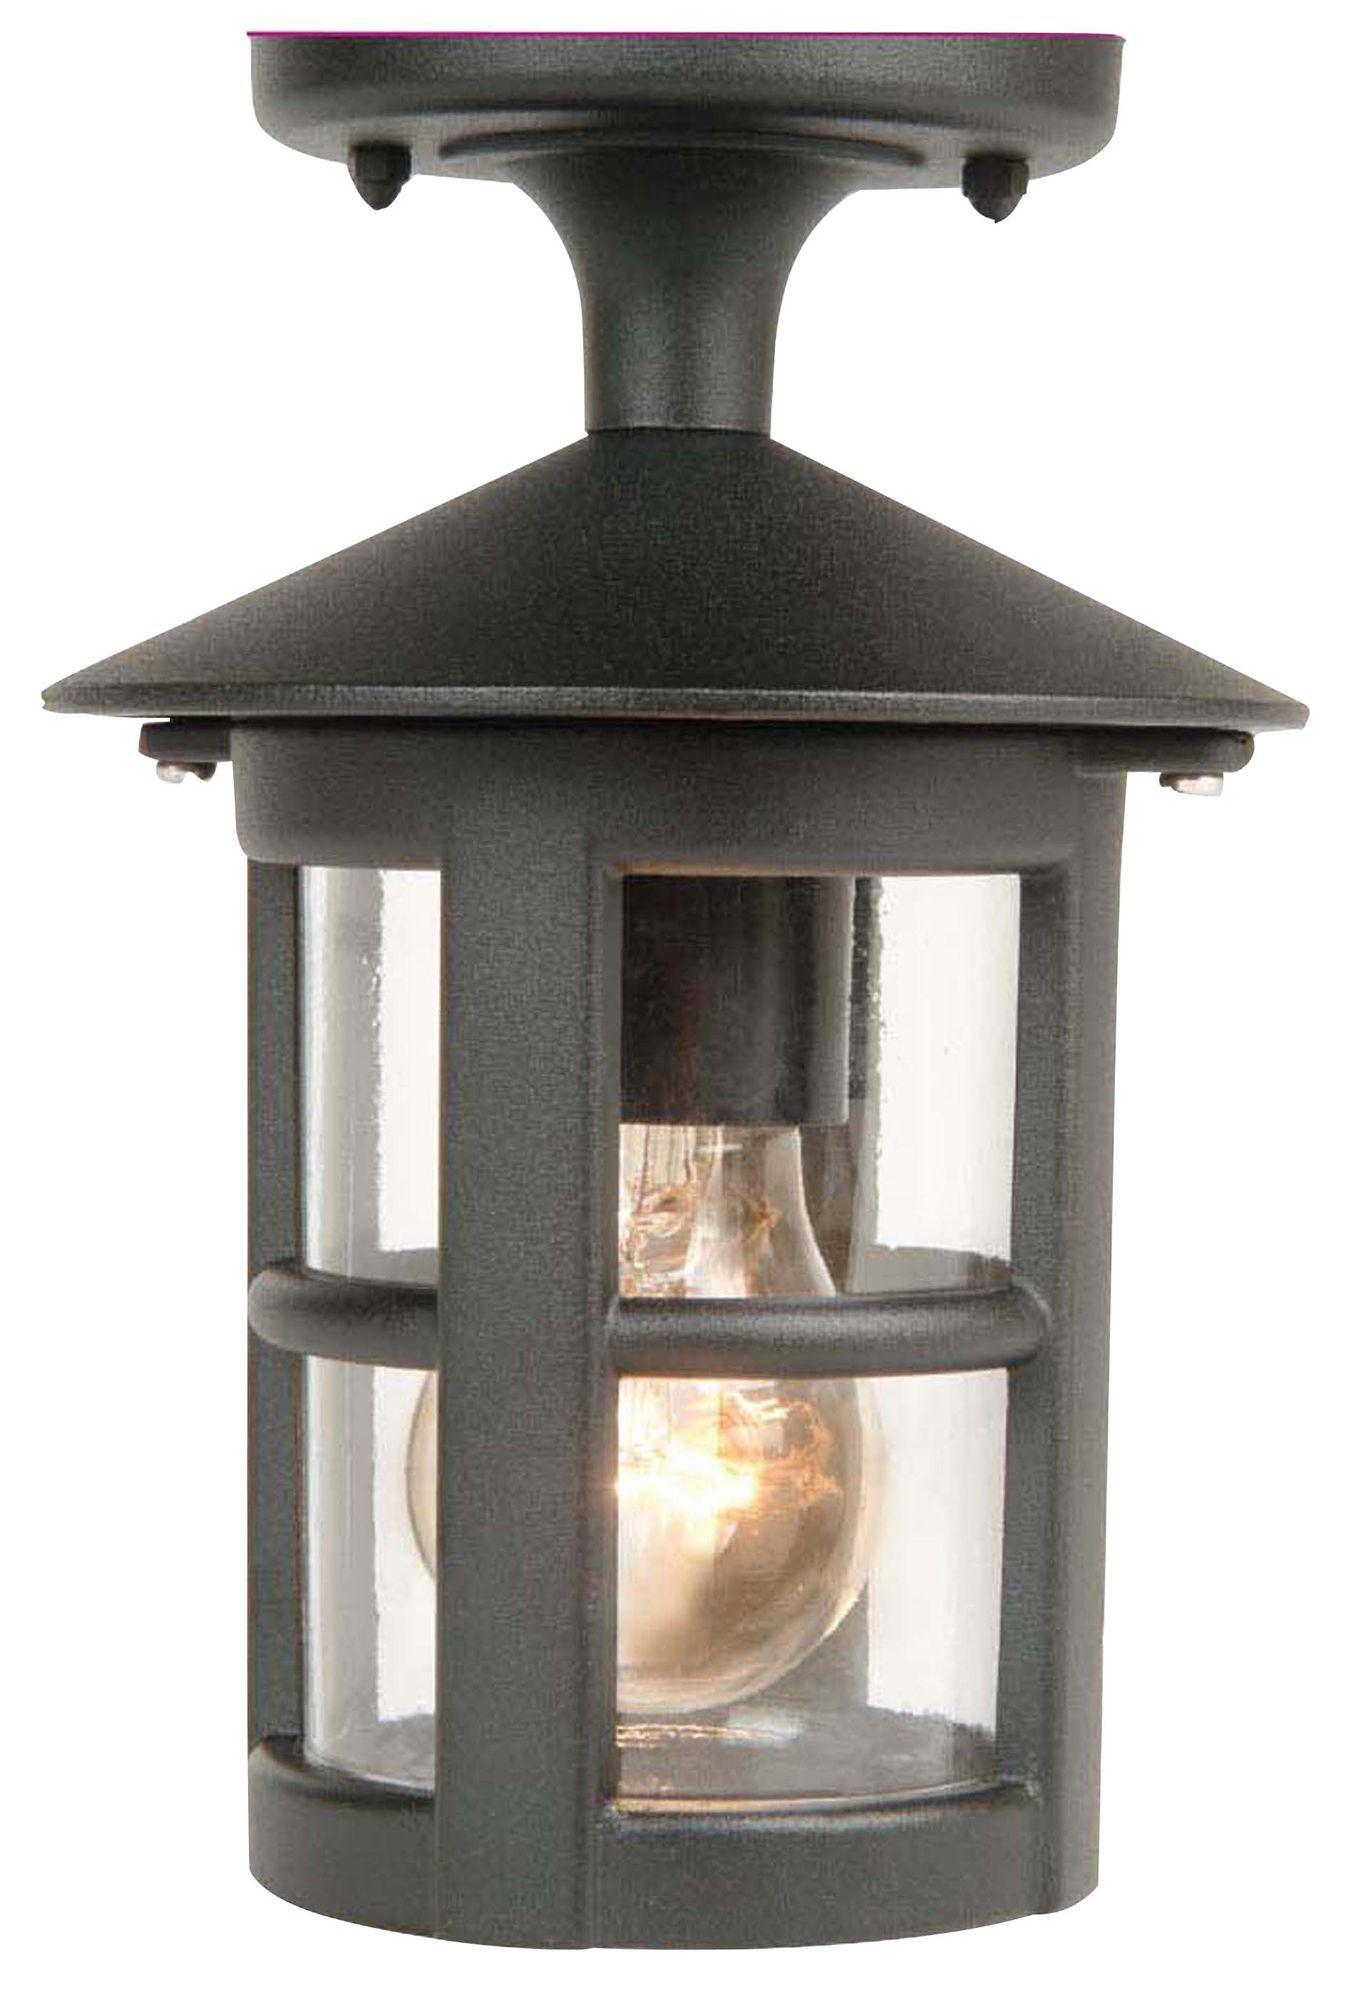 whistler black mains powered external top mounted light